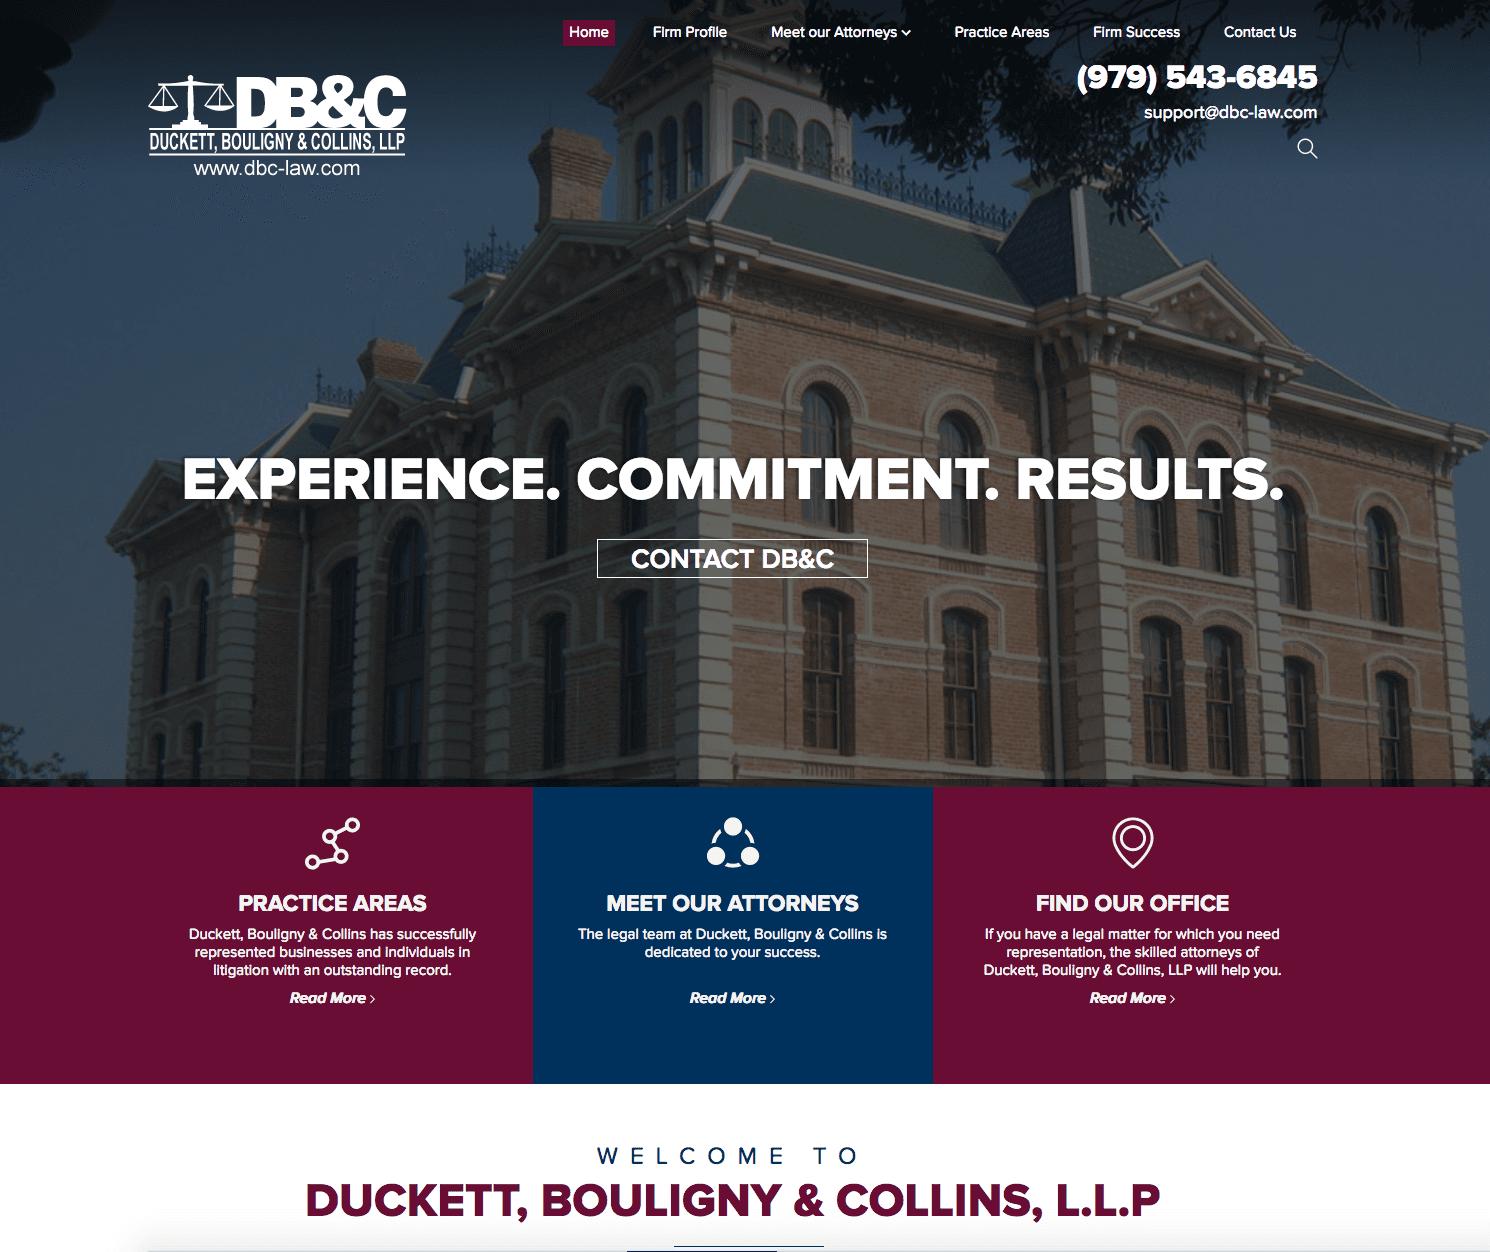 Duckett, Bouligny & Collins